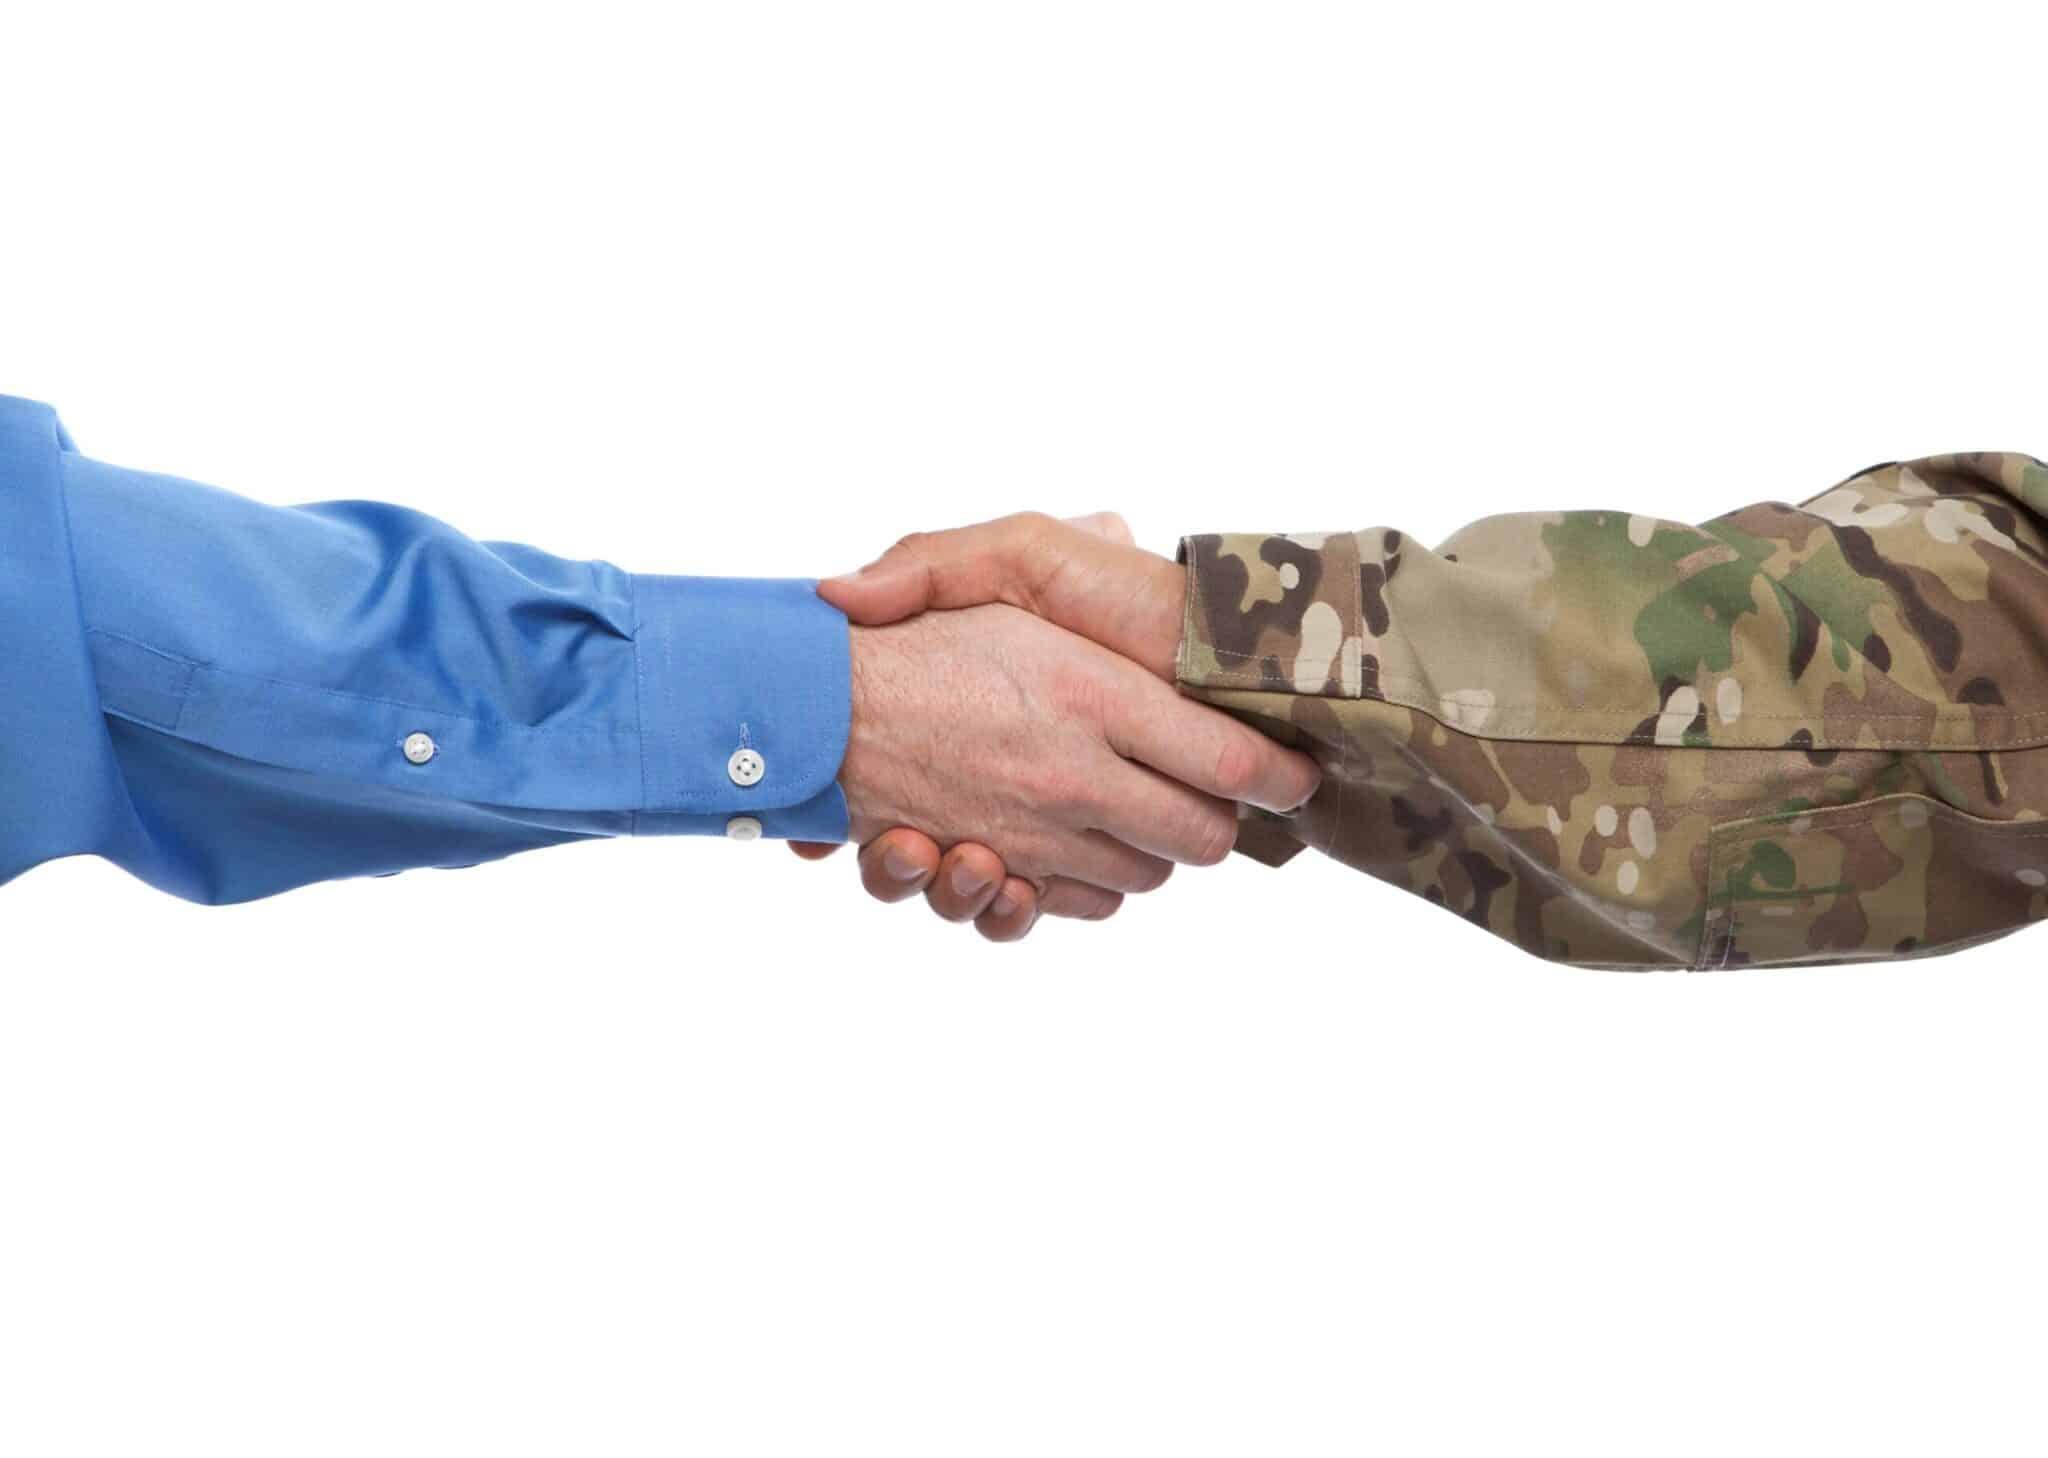 A veteran in uniform accepting a job offer